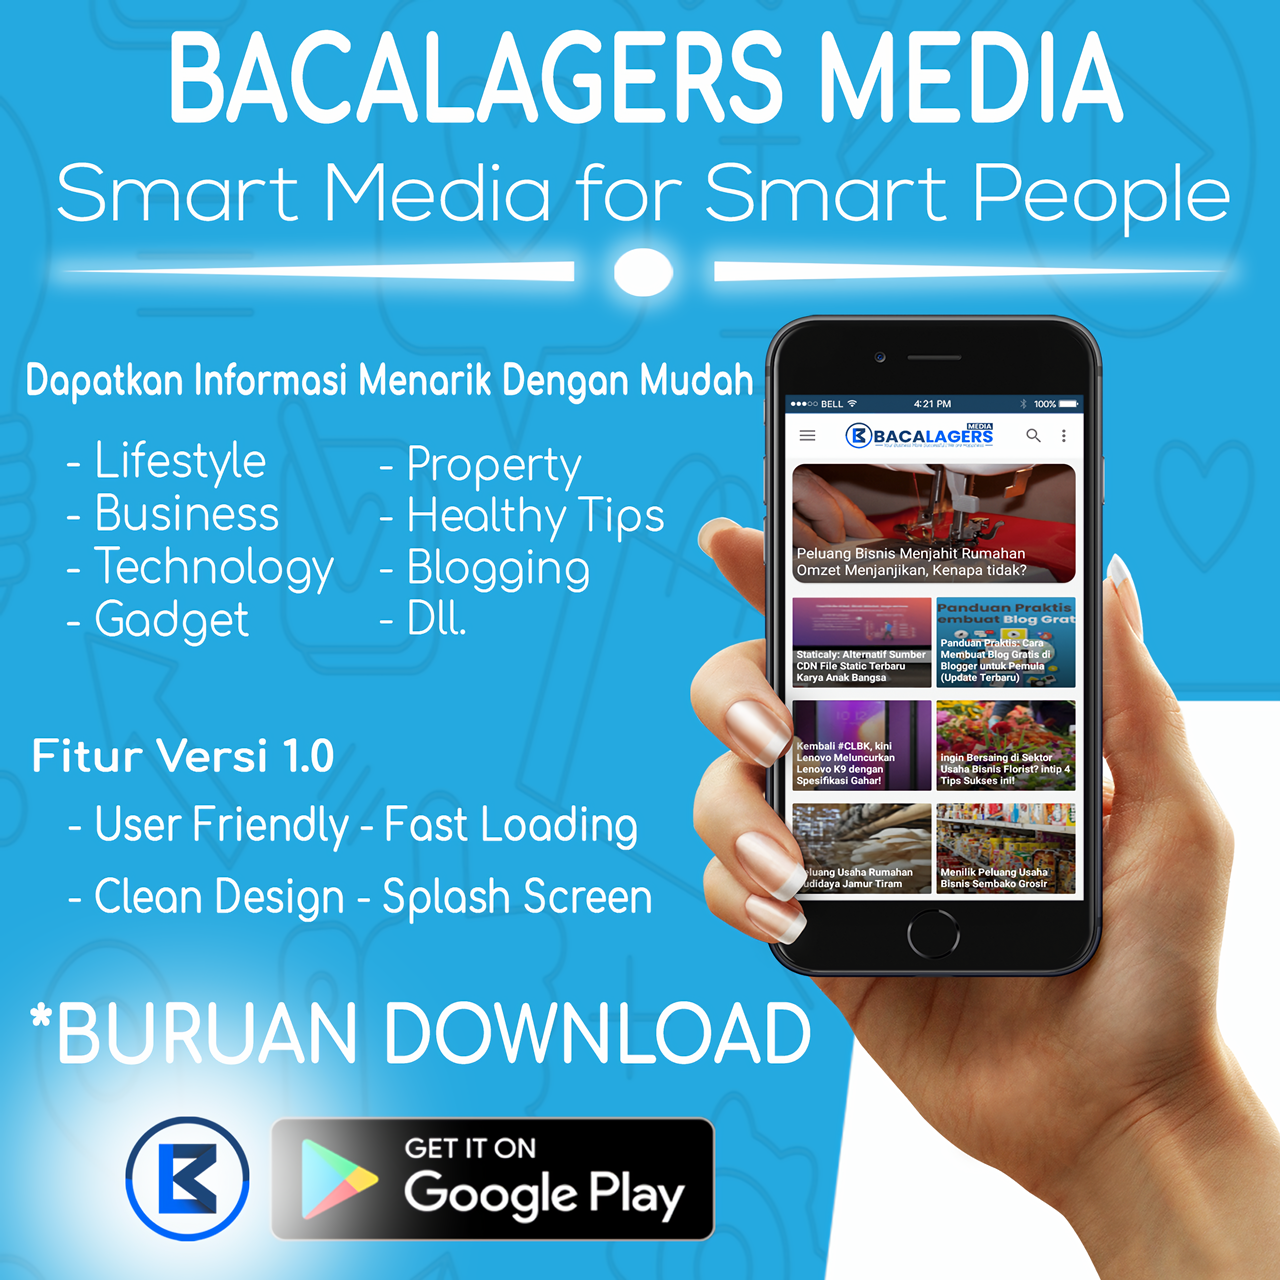 Download Gratis Aplikasi Android Bacalagers Media di Google Play